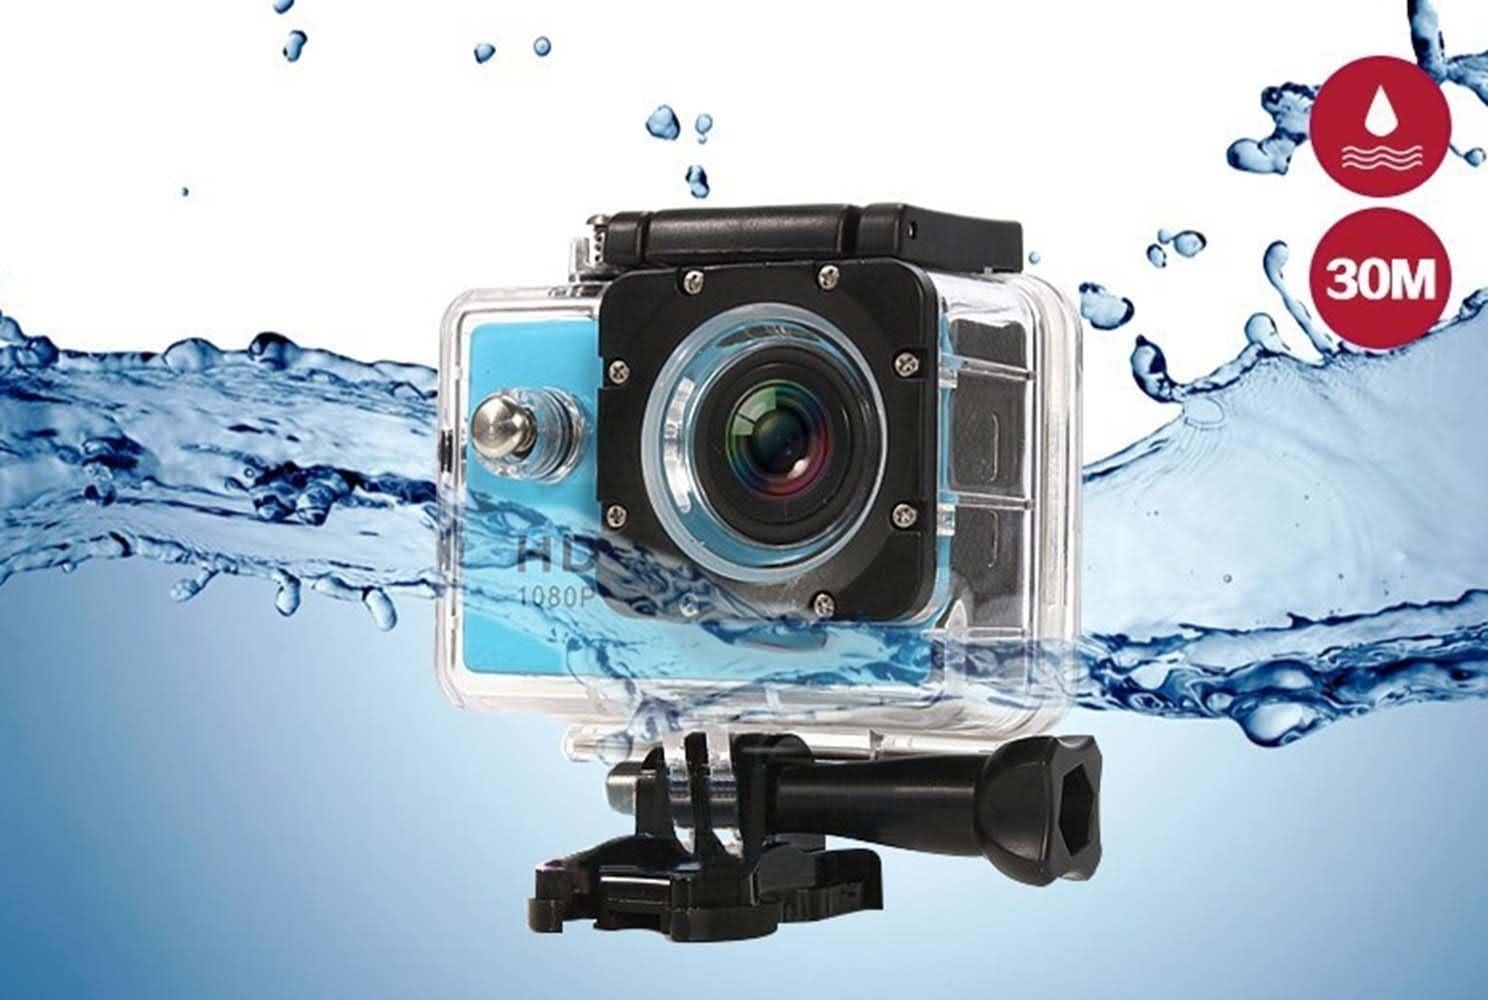 i-TecoSky 1080P Full HD Action Camera Sport Camera Sports Cam SJ4000 30M Waterproof Outdoor Mini Helmet Action Camera Diving Recorder Sports Action Camera Cam Camcorder DVR DV